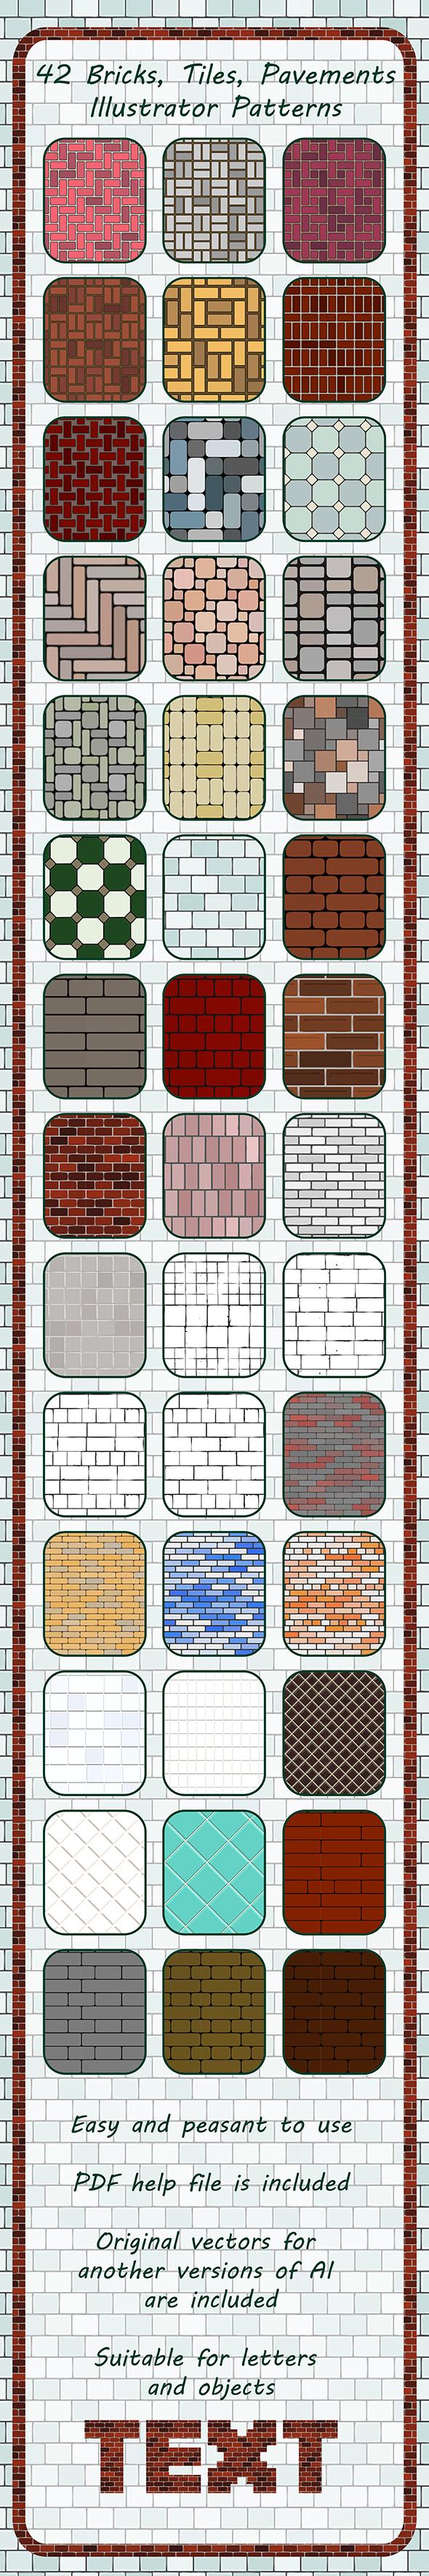 42 Bricks, Tiles, Pavements Seamless Adobe Illustrator Patterns - Miscellaneous Textures / Fills / Patterns